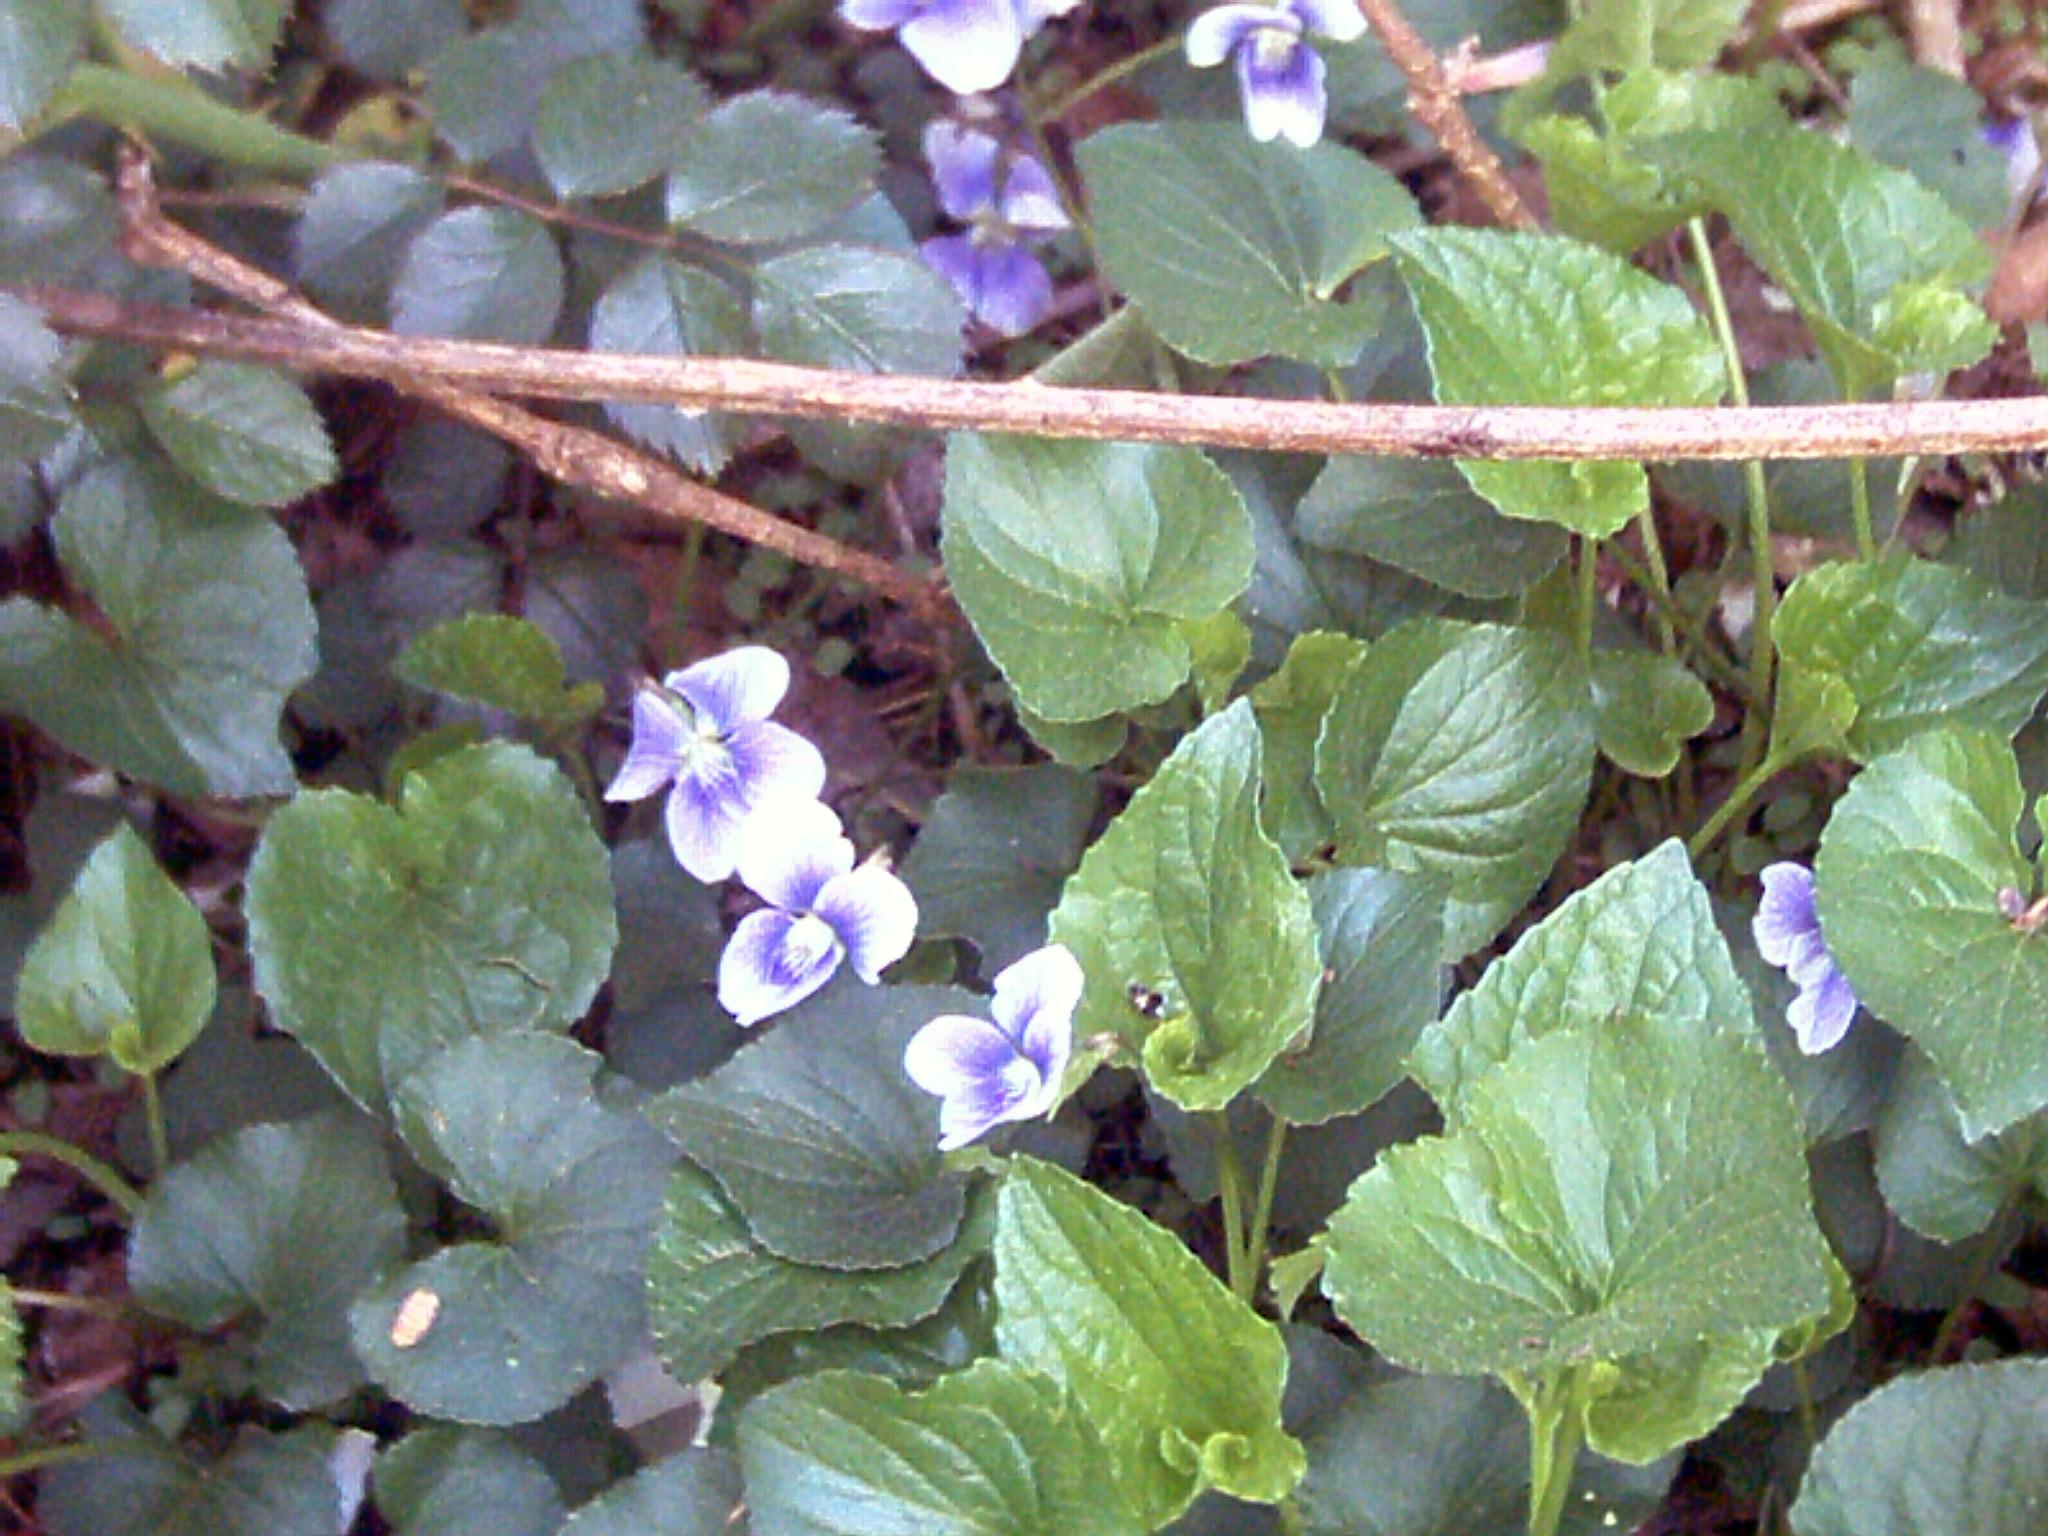 wild violets in bloom